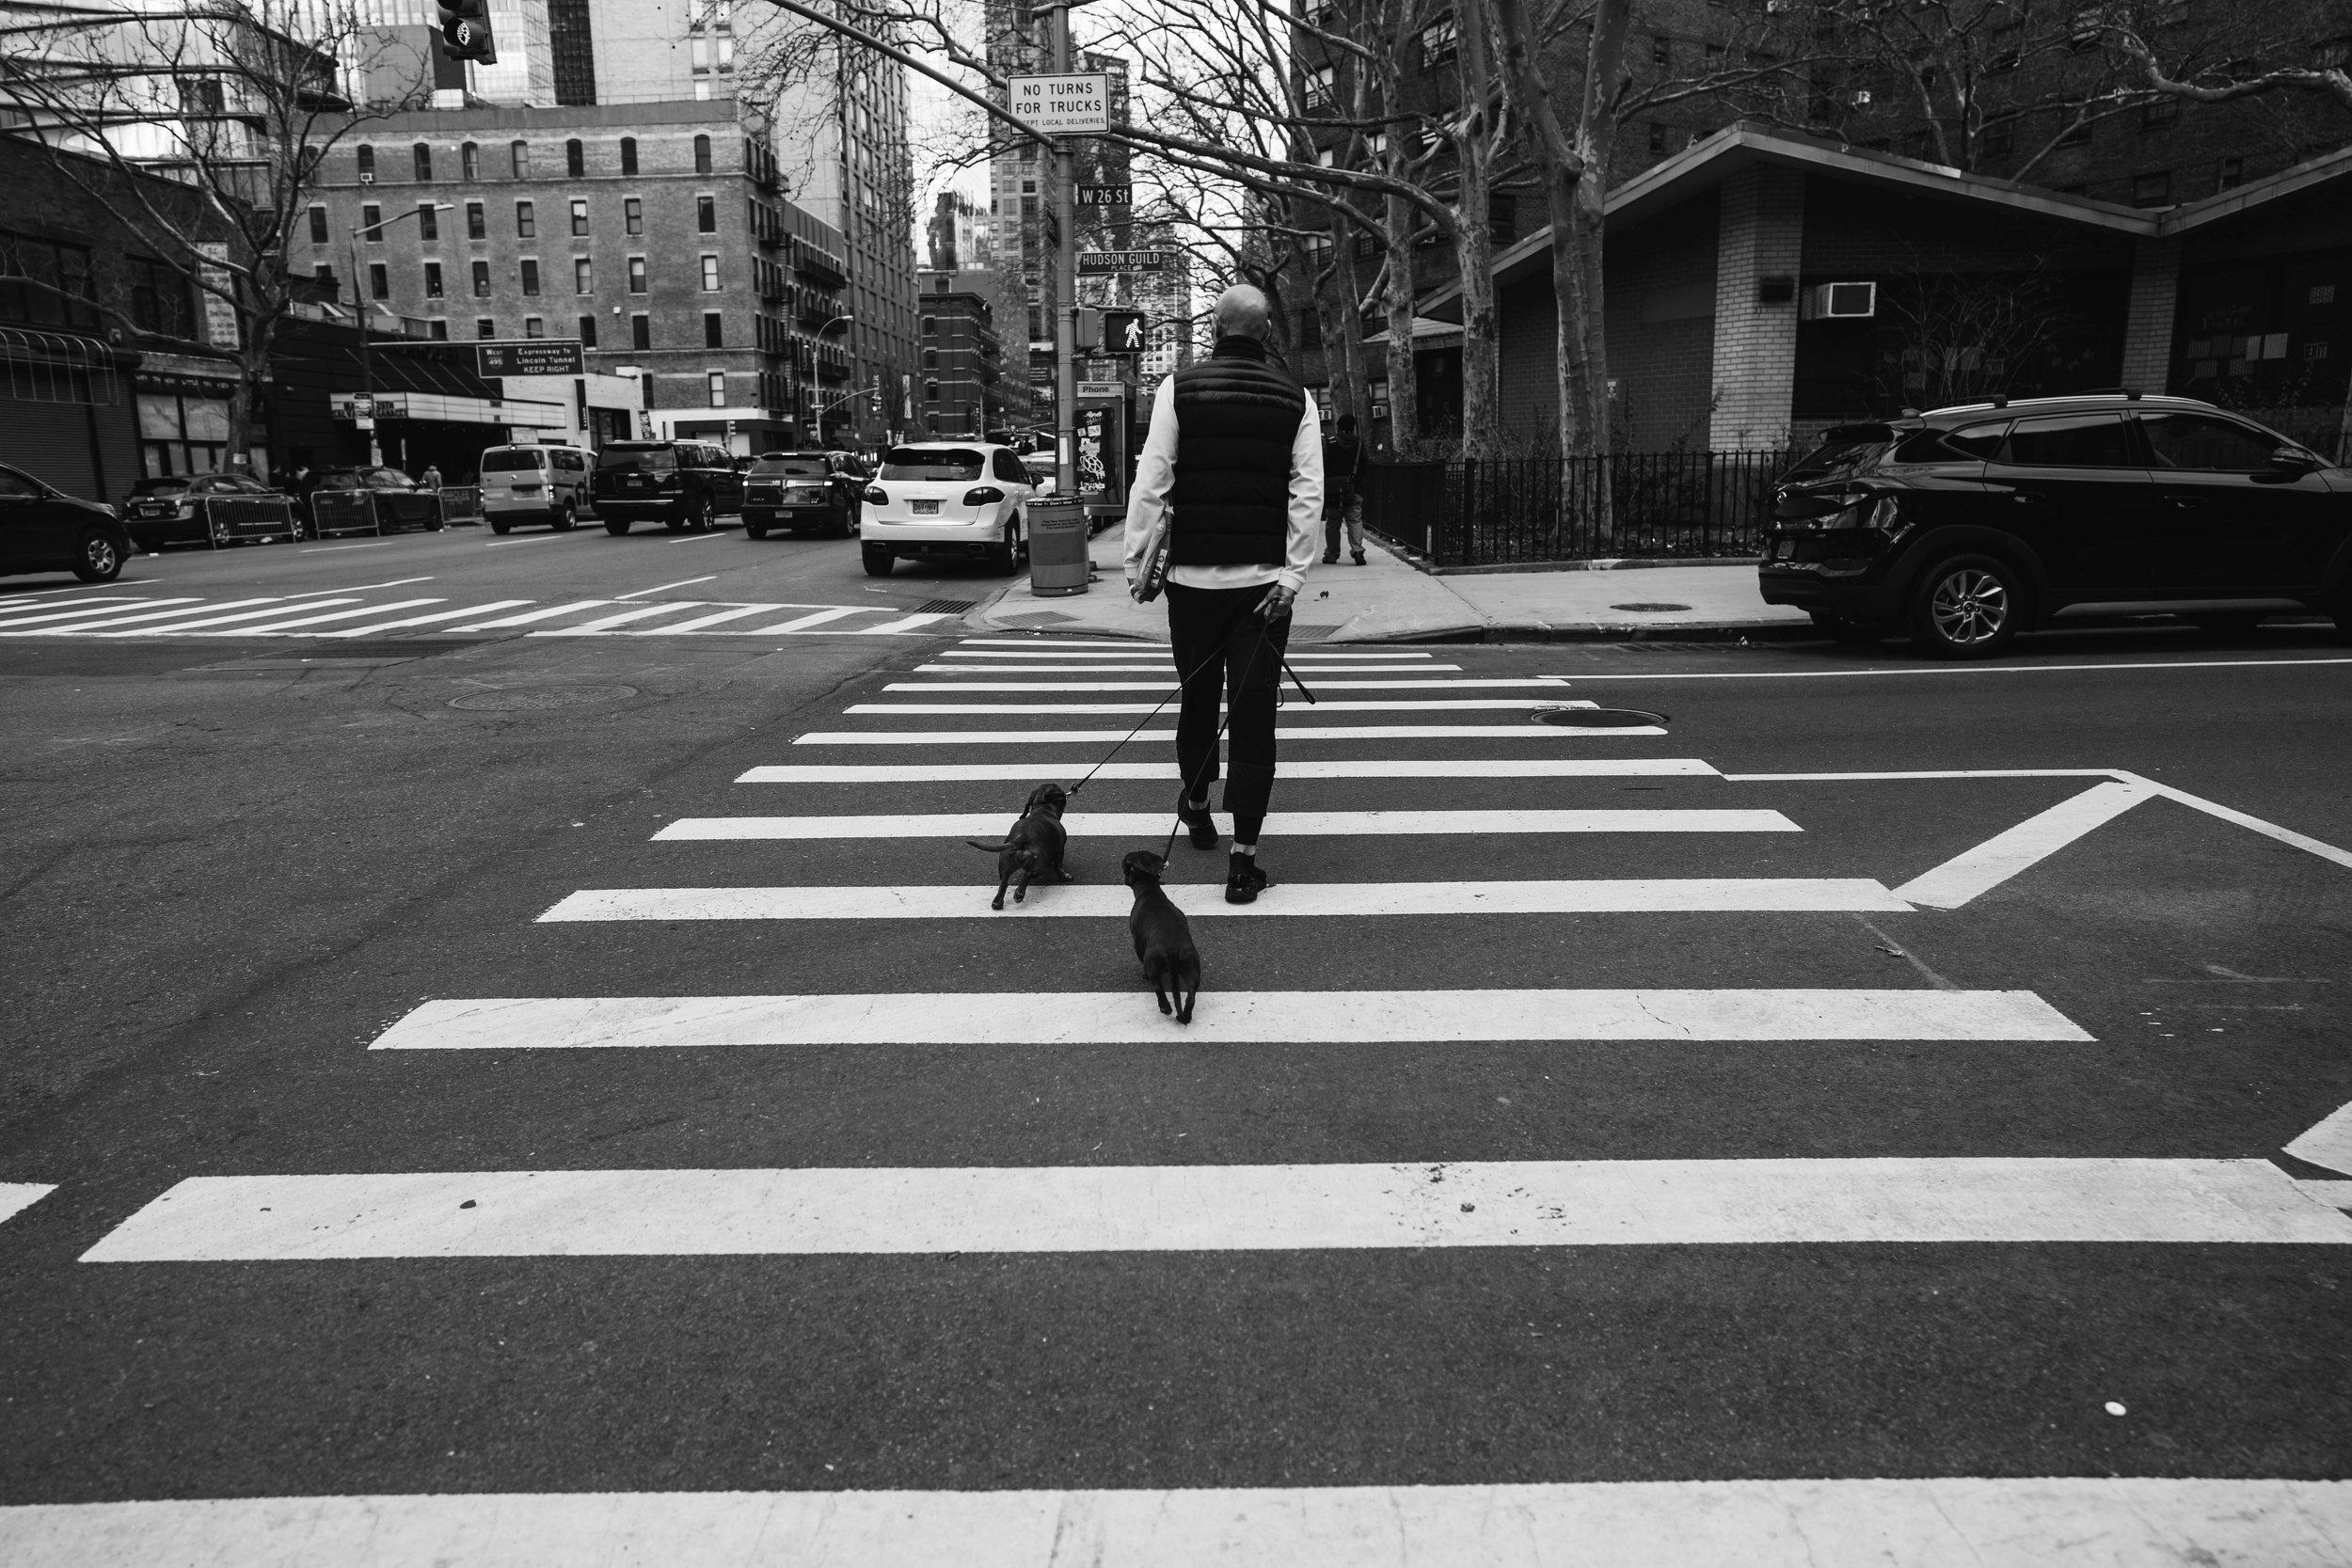 newyork-sony-103349.jpg